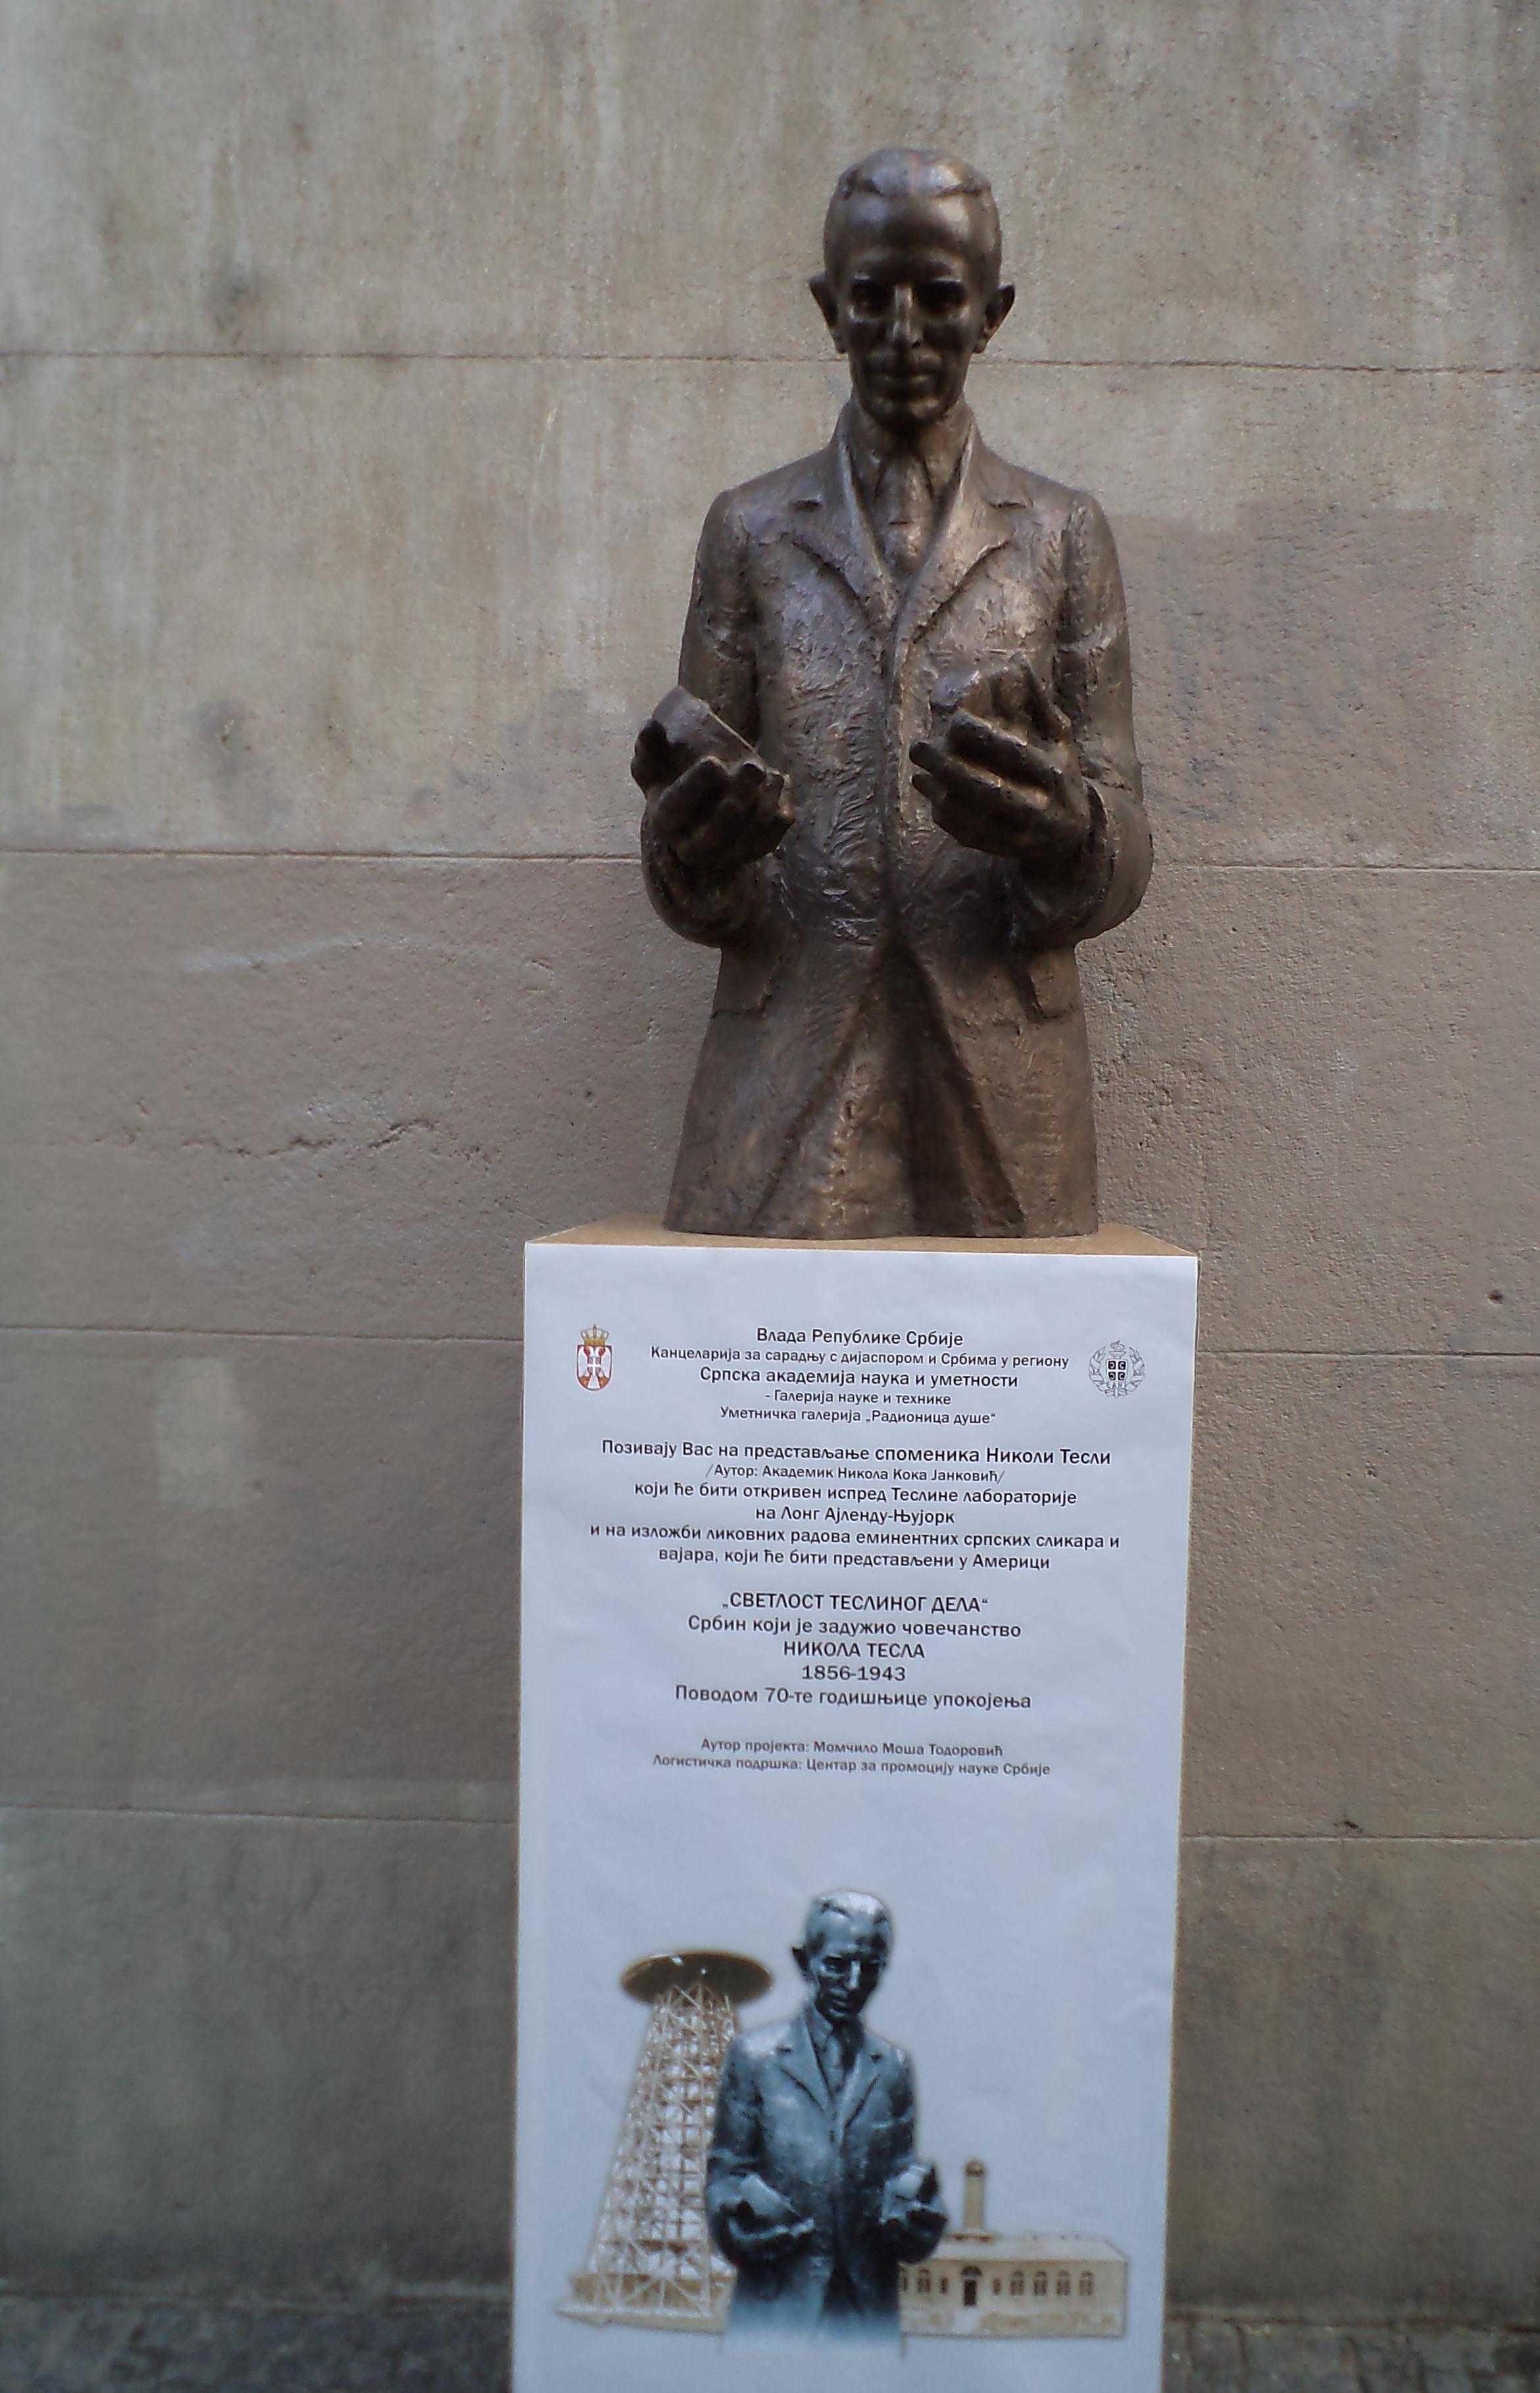 Koka Jankovic, Nikola Tesla